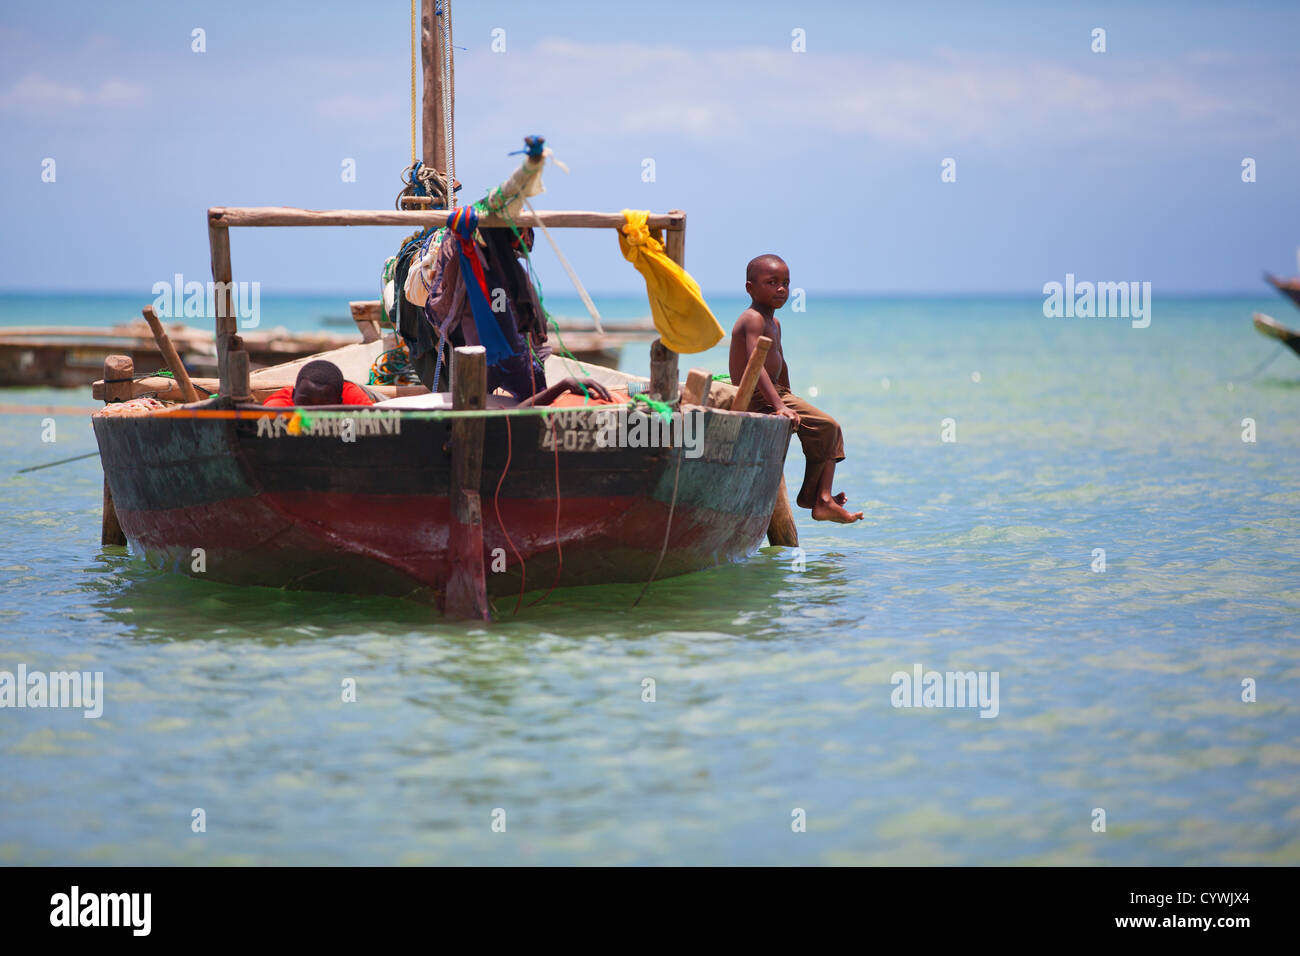 Boy sat on side of fishing boat, Zanzibar, Tanzania. - Stock Image